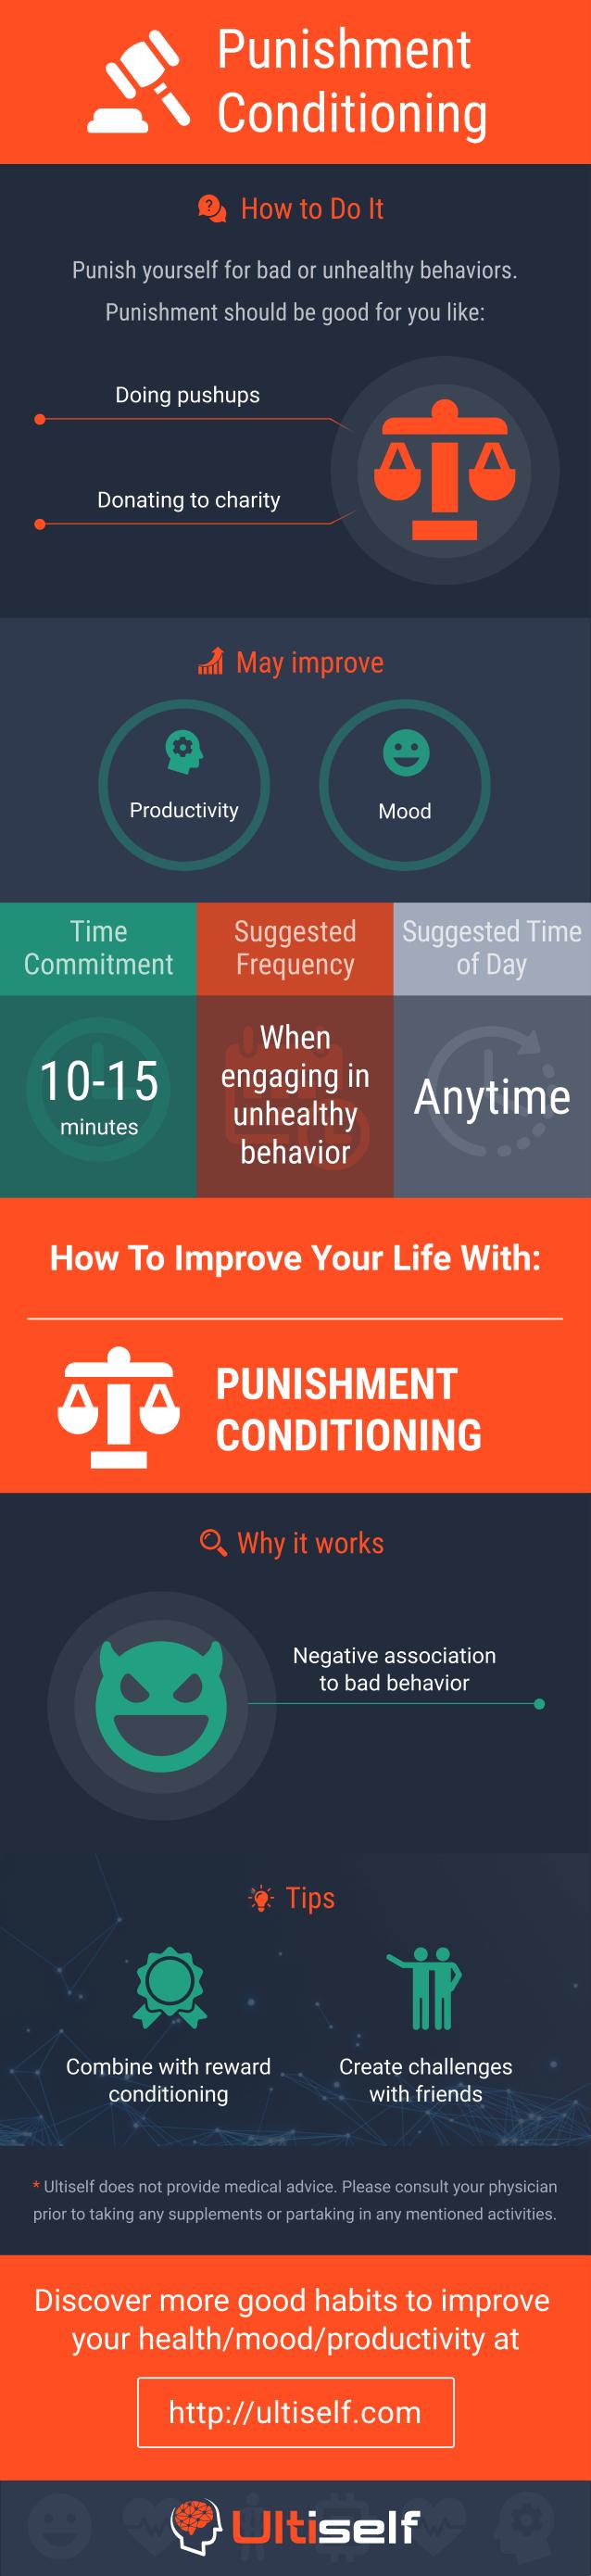 Punishment conditioning infographic